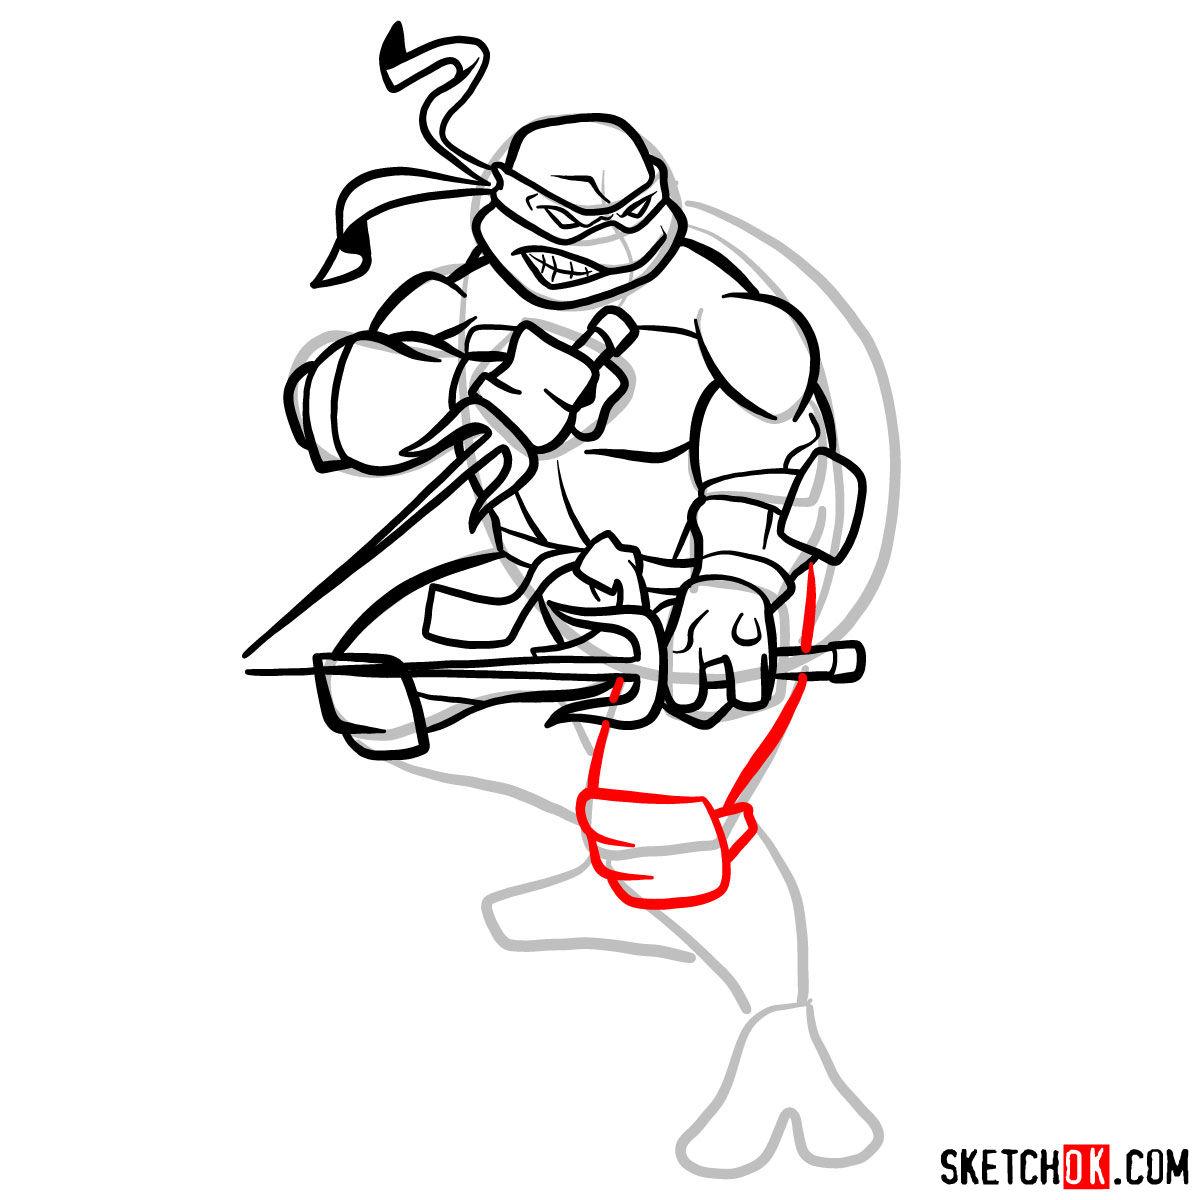 How to draw angry Raphael teenage mutant ninja turtle - step 11